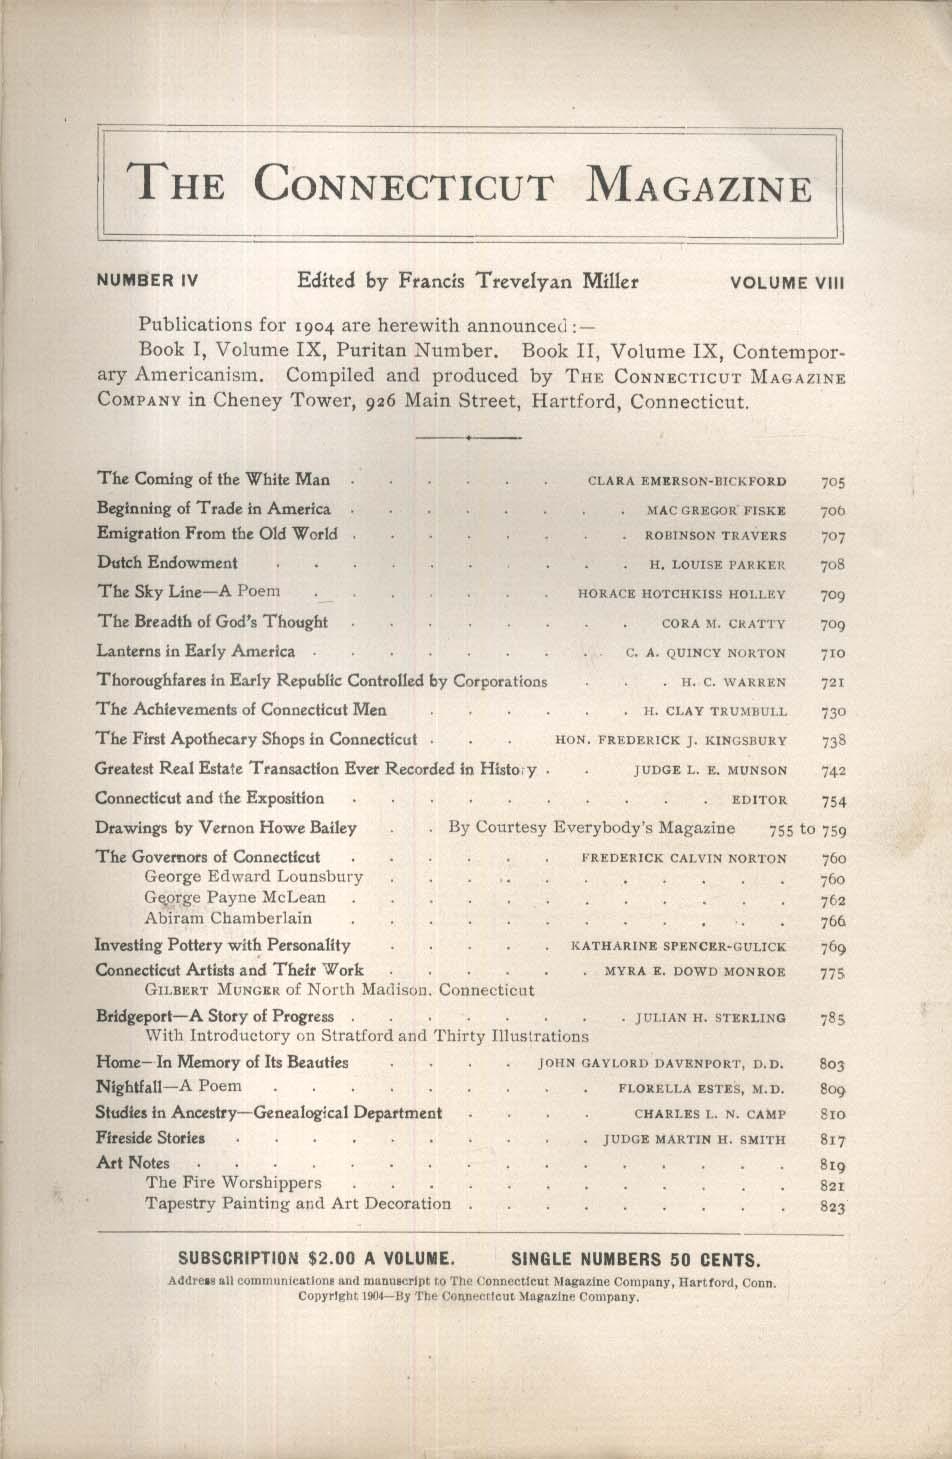 CONNECTICUT MAGAZINE Louis Orr John Guernsey Bridgeport Heredity Pottery 6 1904